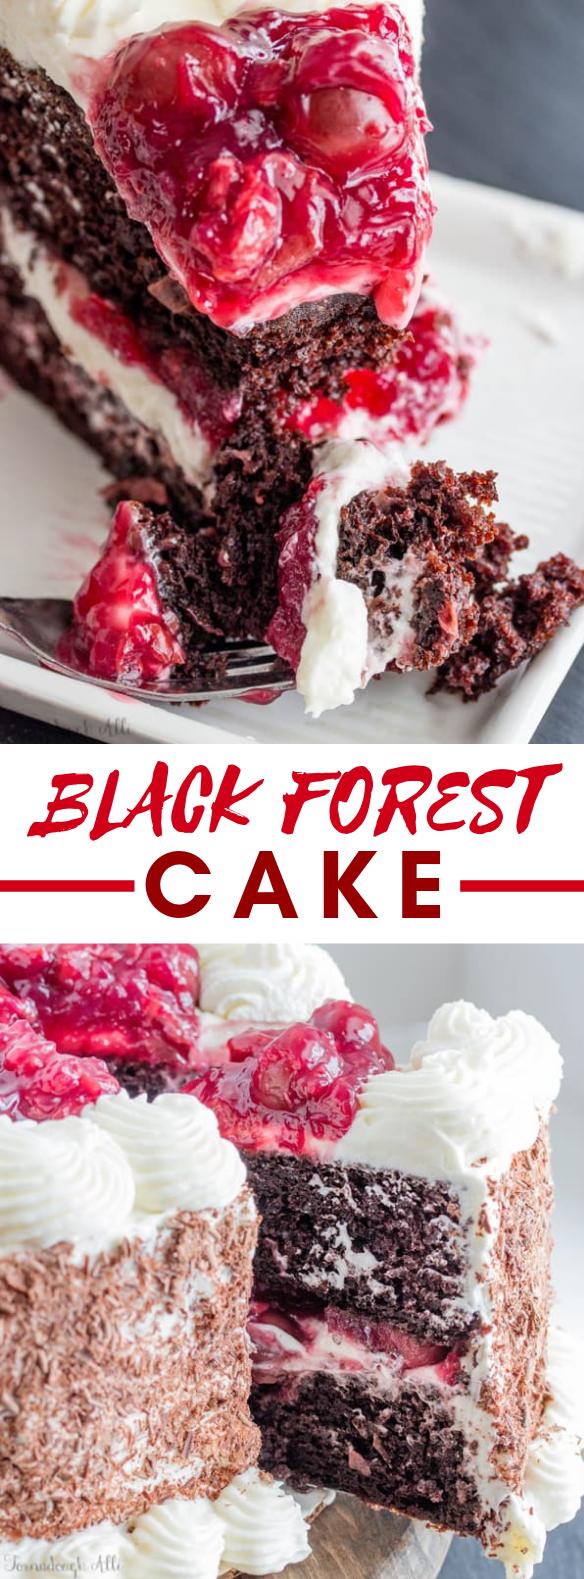 BLACK FOREST CAKE #desserts #cakerecipe